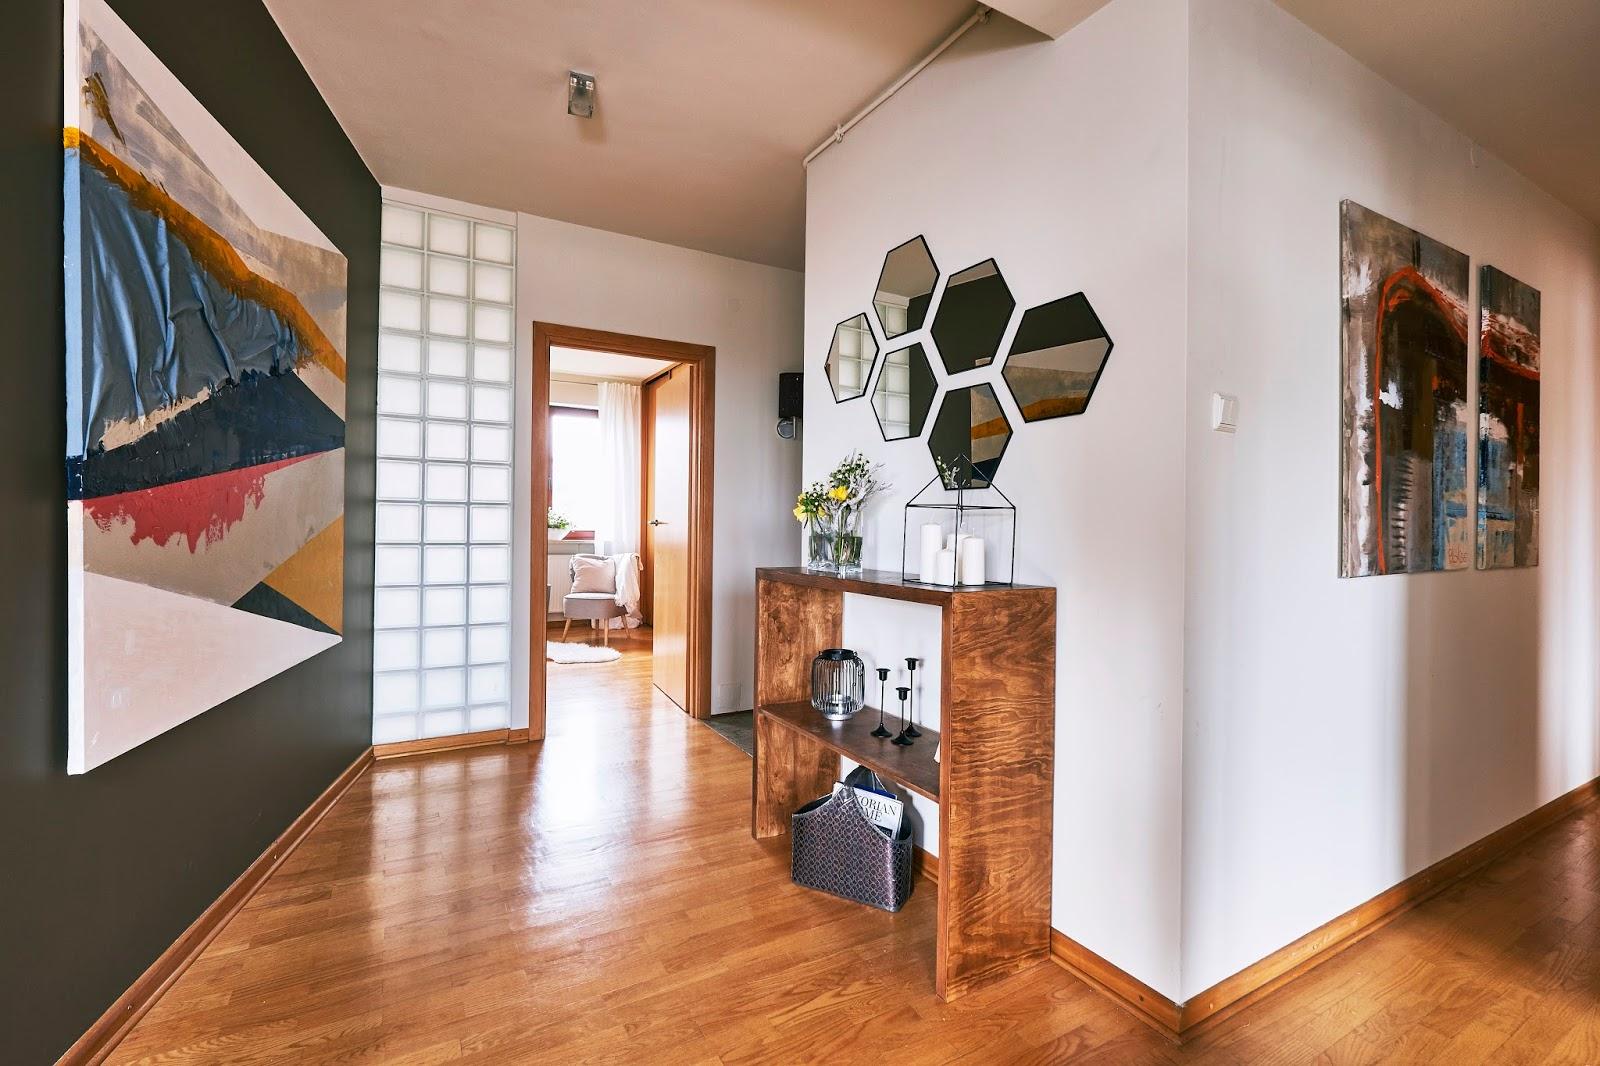 Mieszkanie po metamorfozie / home staging - Projektantka ma PLAN